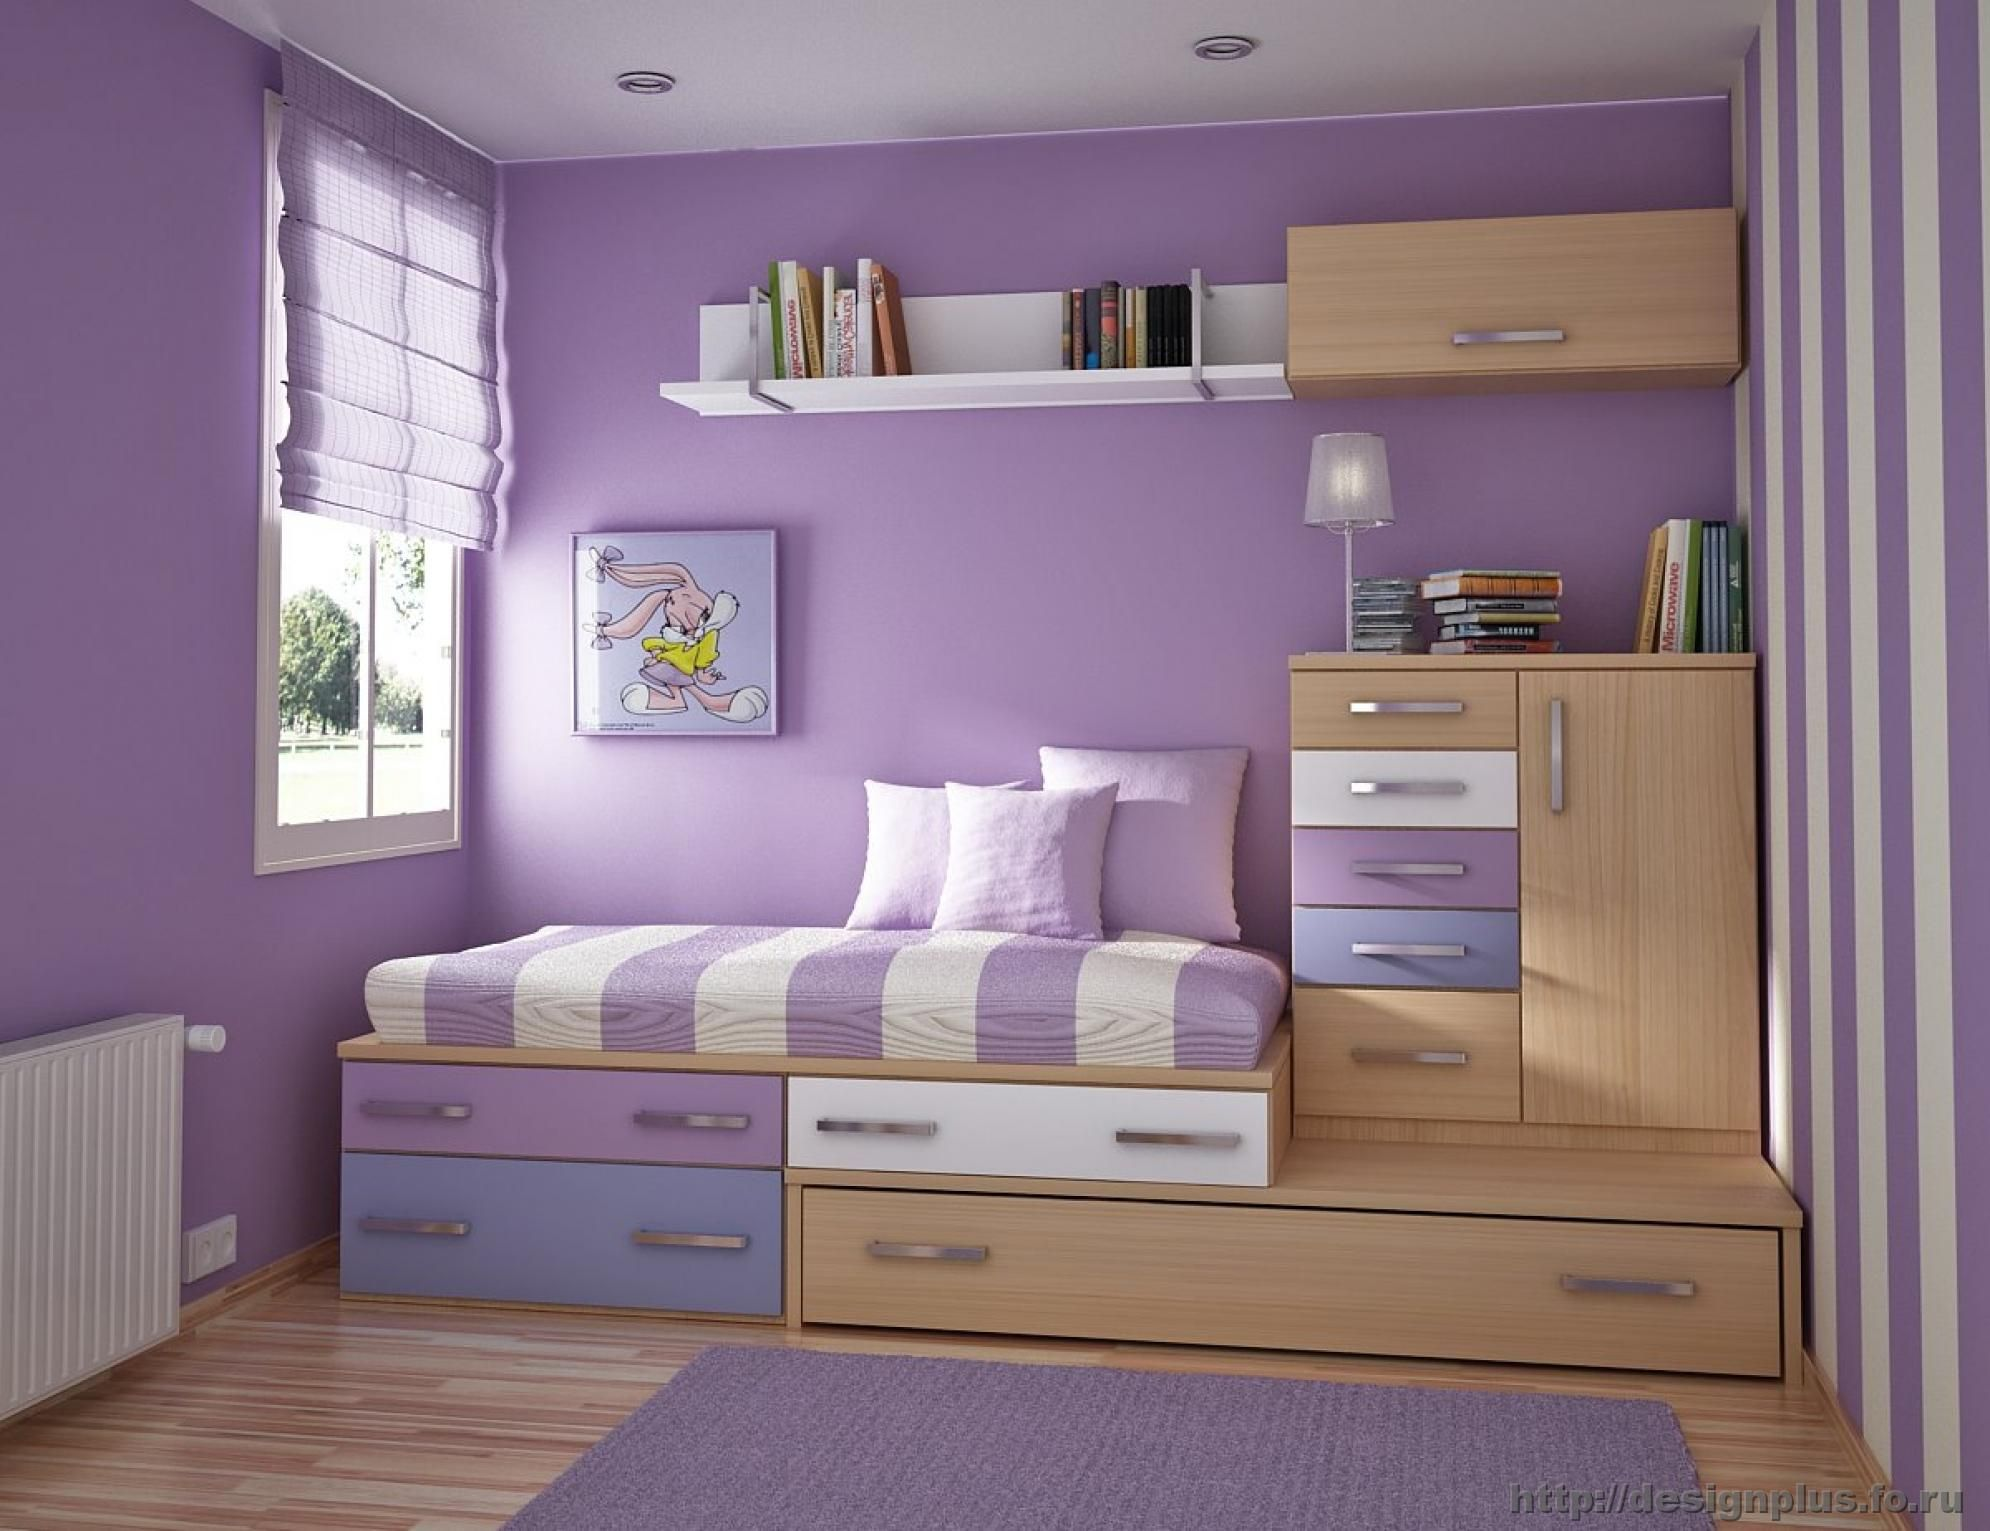 Etagenbetten Kaufen : Kaufen etagenbetten jungen twin loft bett